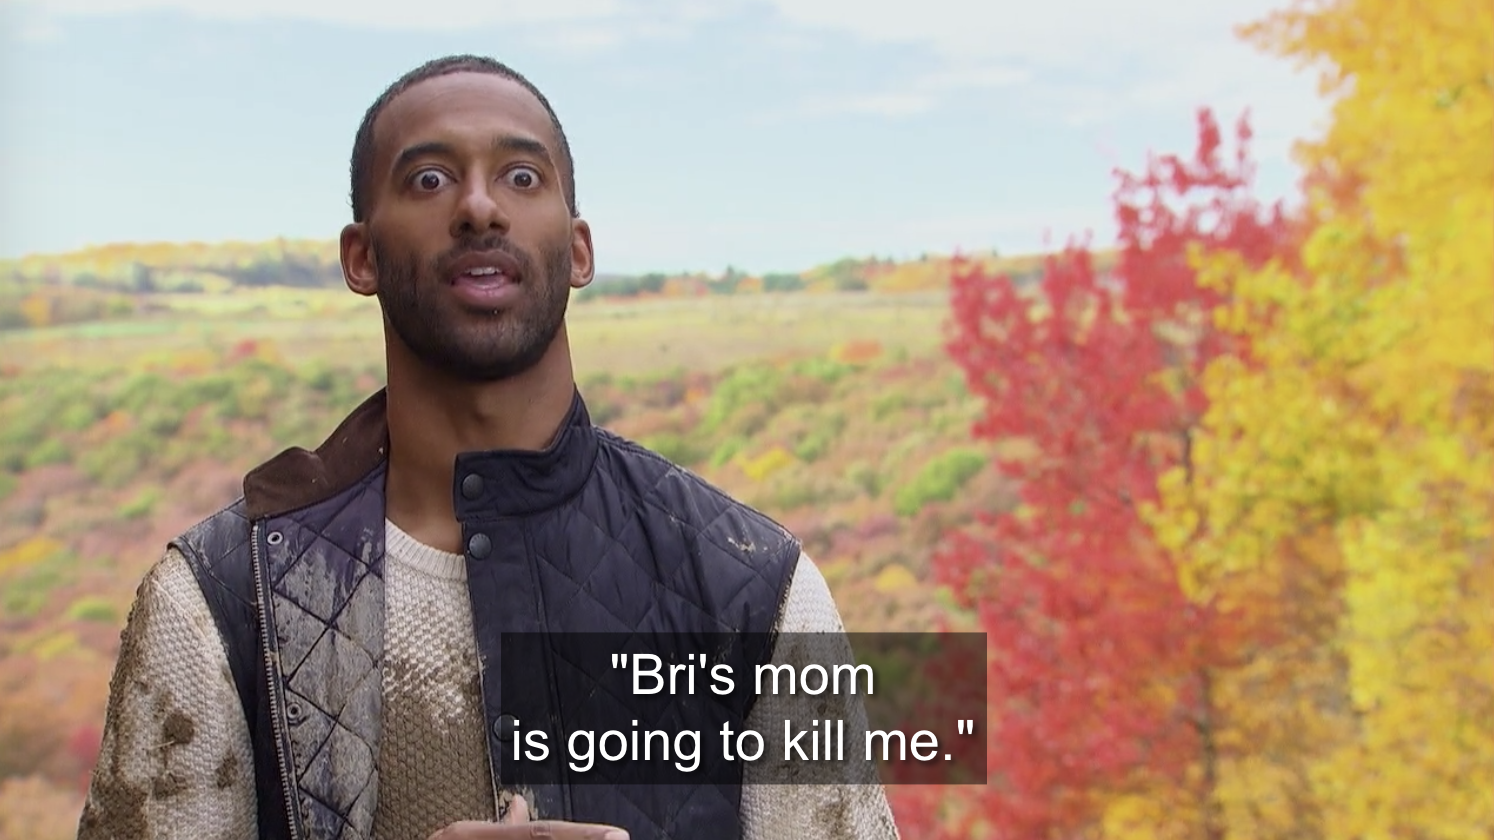 Matt James apologizing to Bri's mom